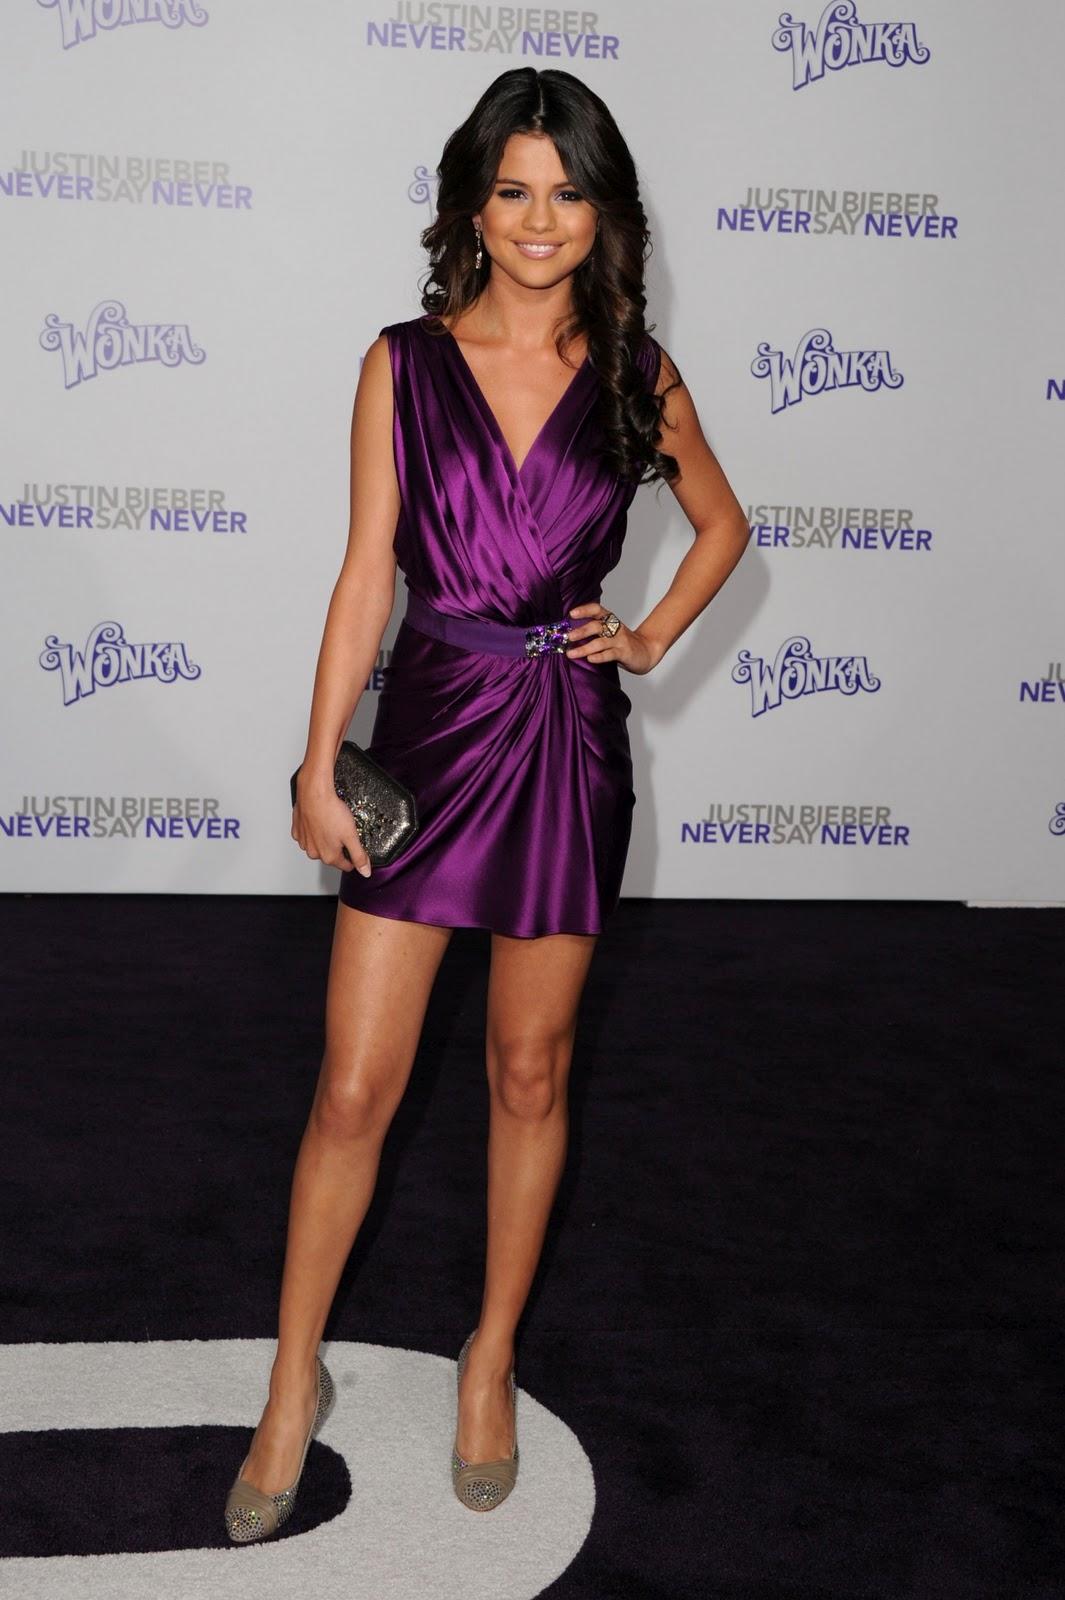 http://3.bp.blogspot.com/-g--53Z5W2SE/TVQppdeCtrI/AAAAAAAAPTQ/J0WTUDrPD-o/s1600/Selena-Gomez-1.jpg